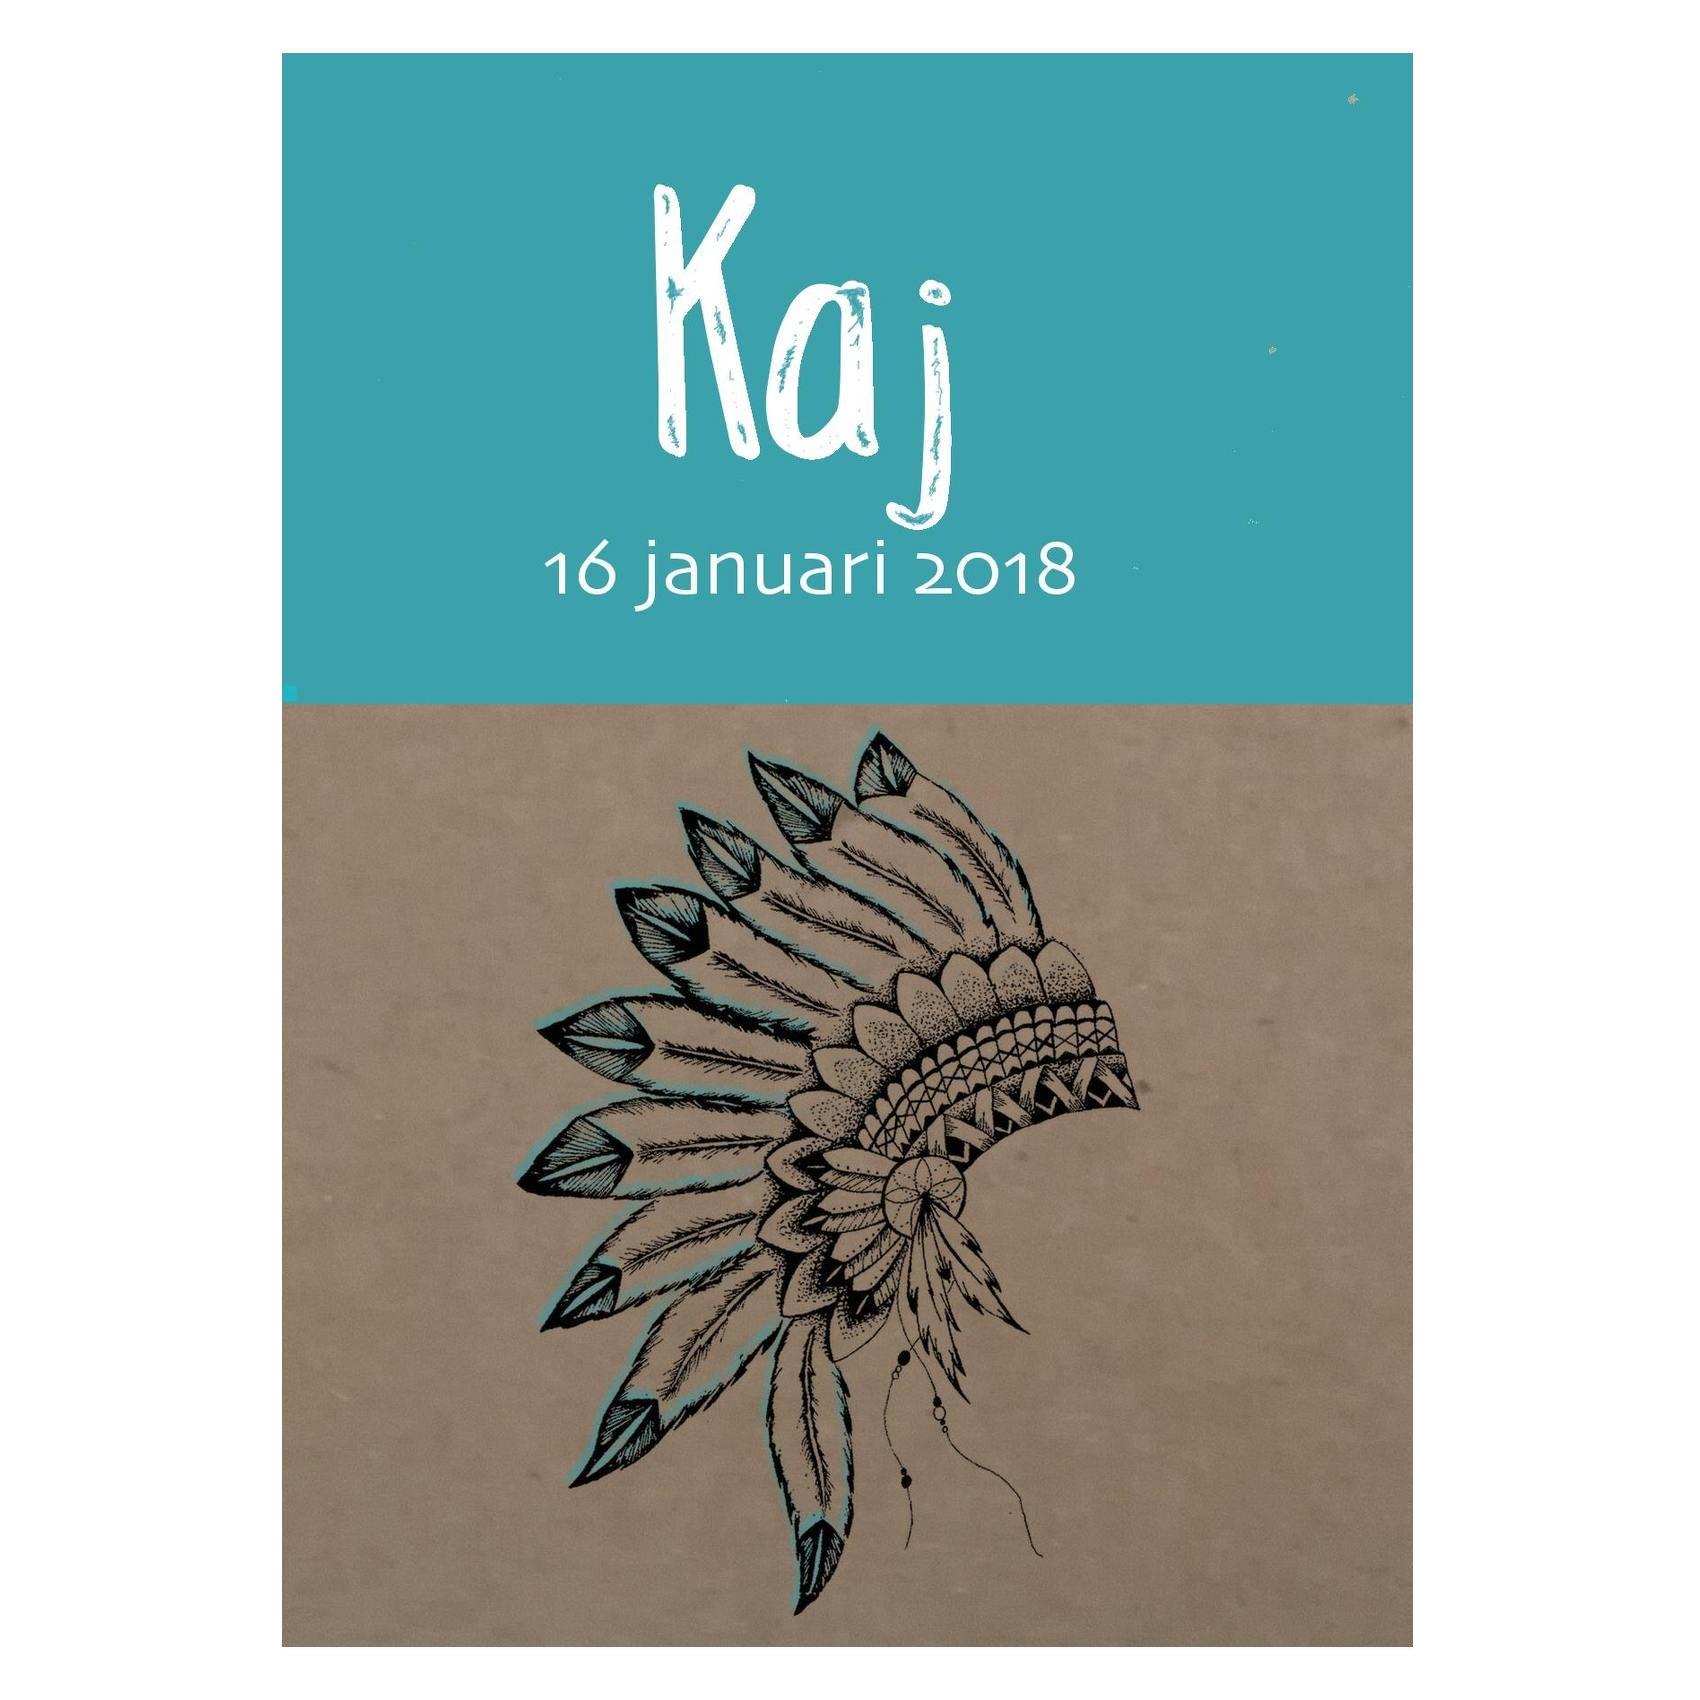 Knapzak Design - Geboortekaartje Indianentooi voorkant